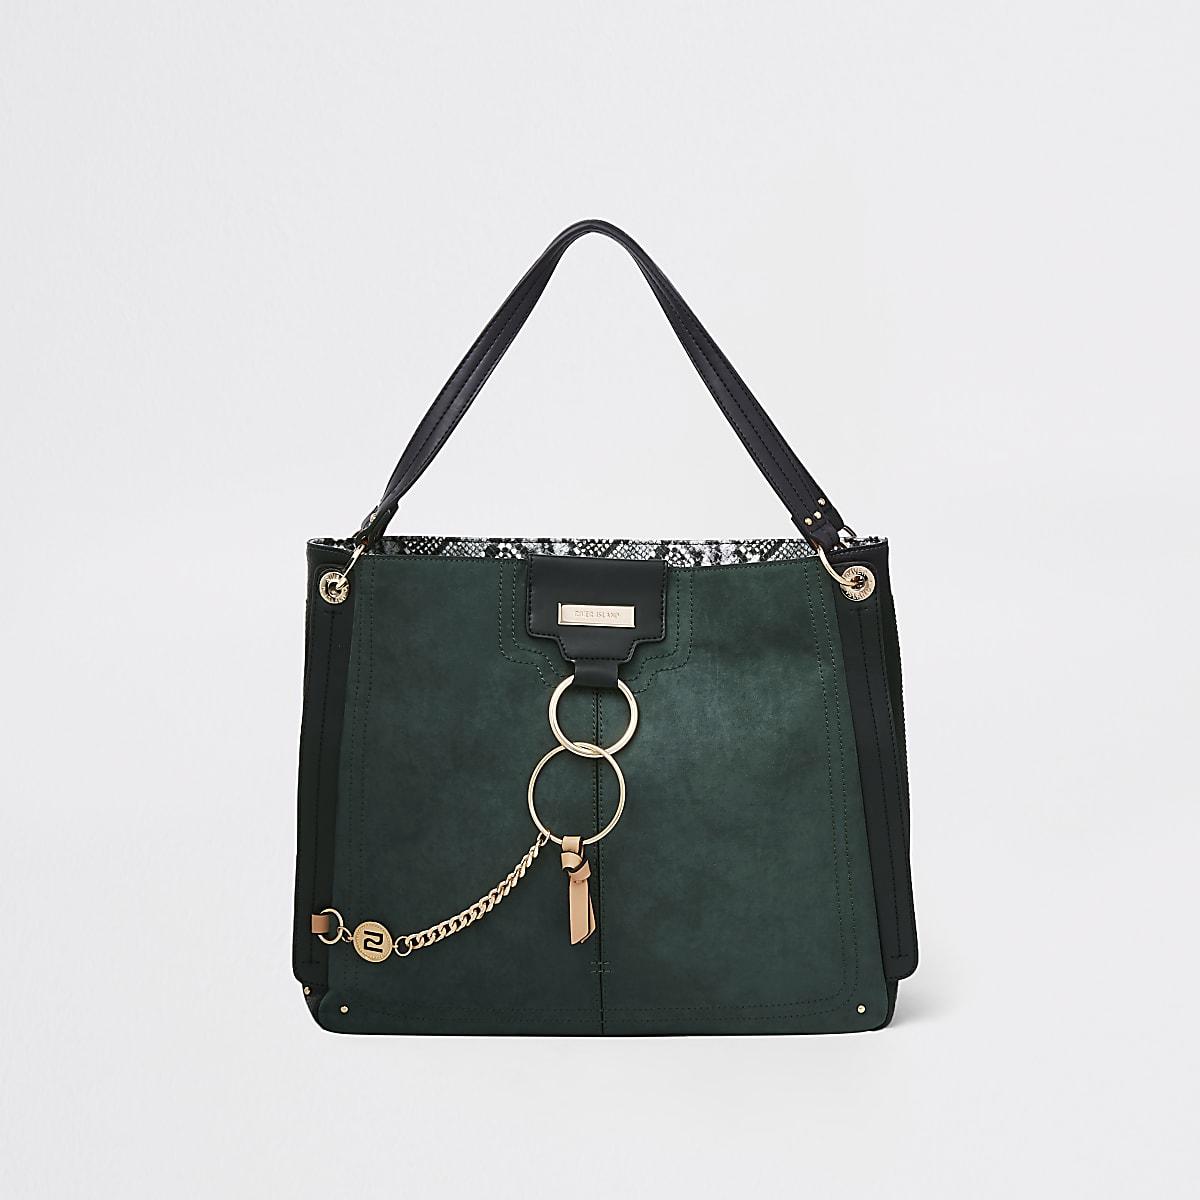 Donkergroene oversized tas met metalen ring